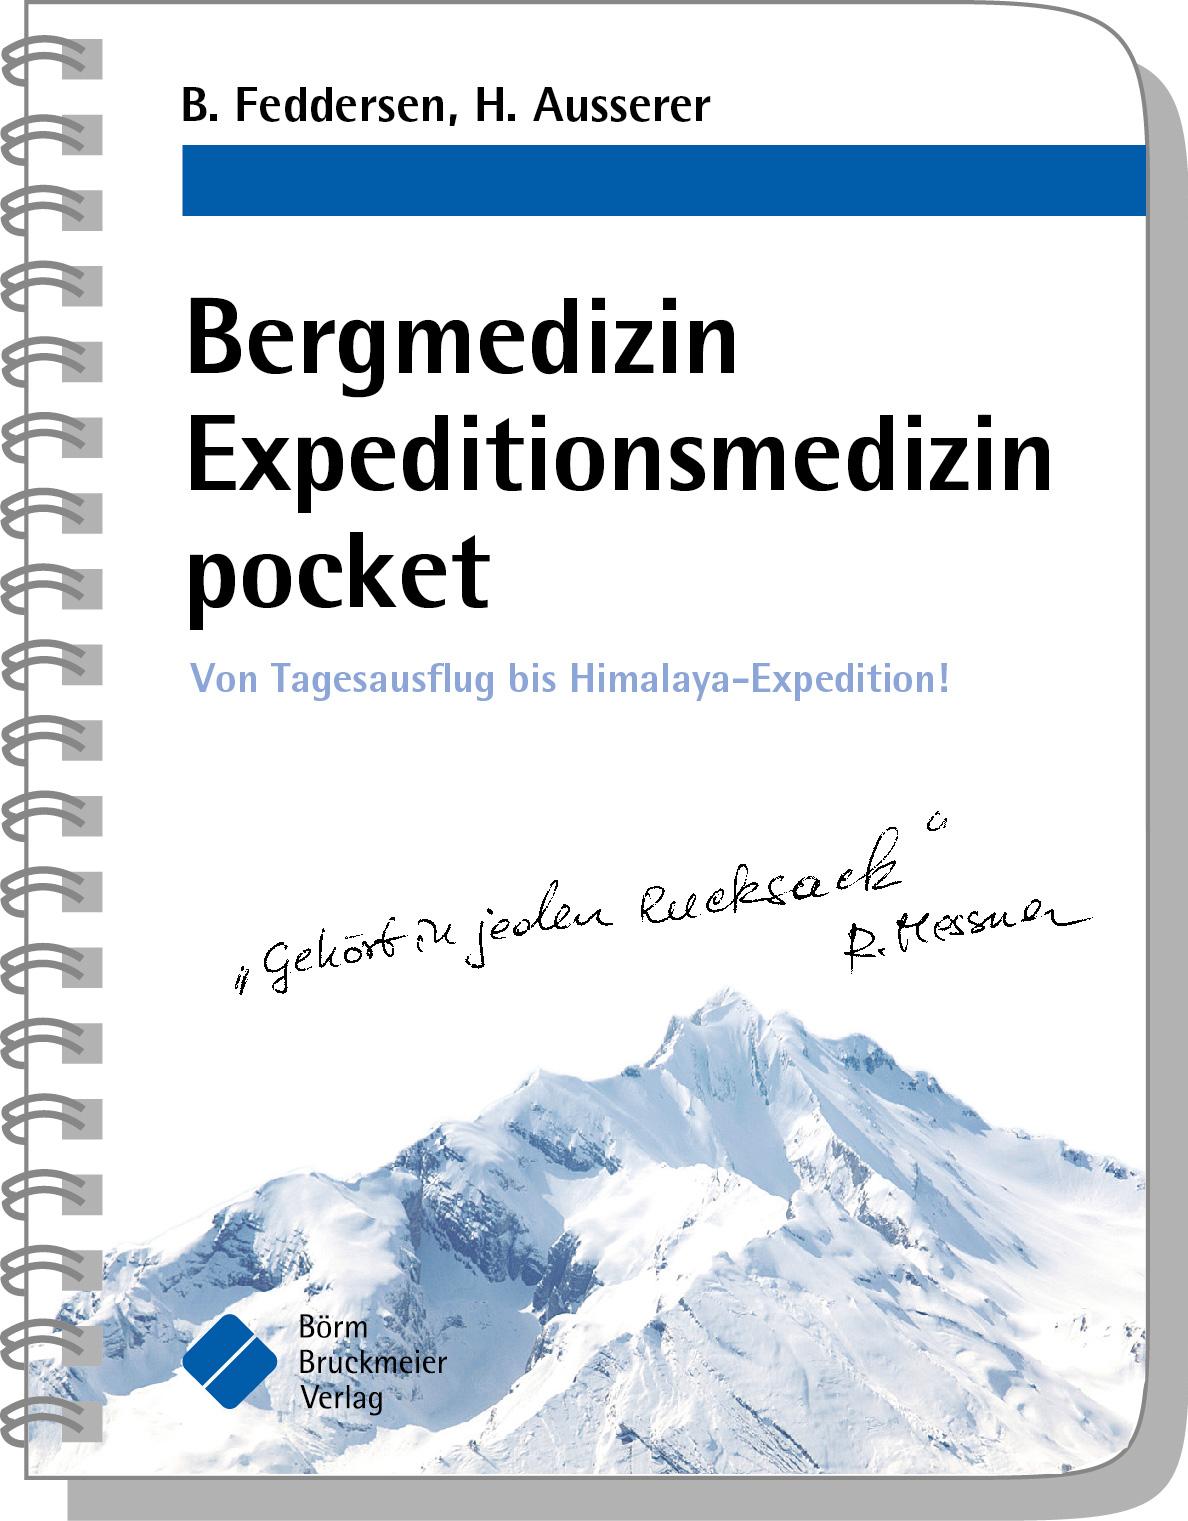 NEU Bergmedizin Expeditionsmedizin pocket Harald Ausserer 627436